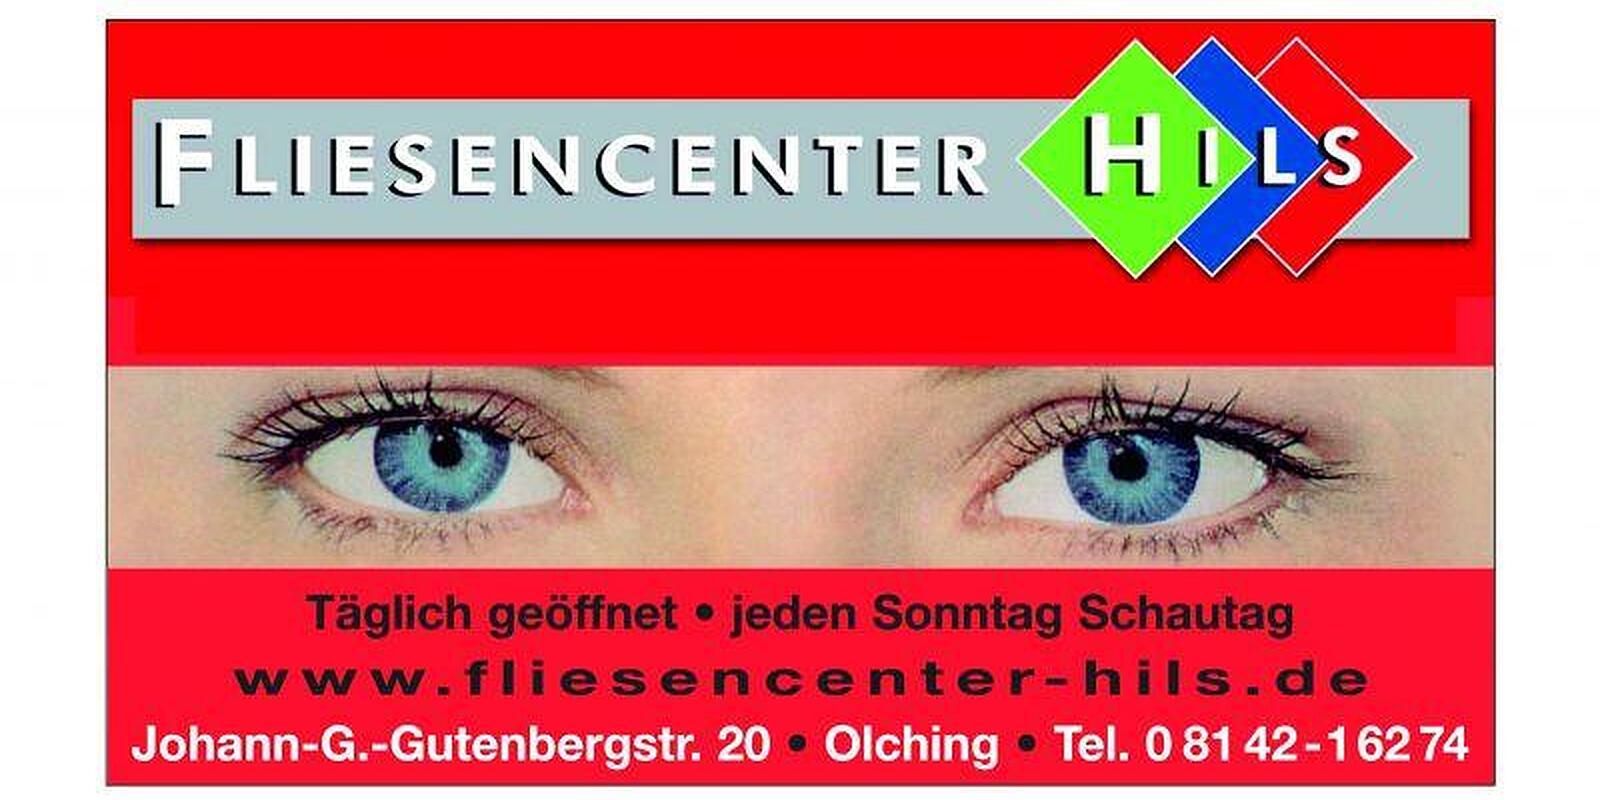 fliesencenter hils johann g gutenberg str olching fliesencenter hils willkommen. Black Bedroom Furniture Sets. Home Design Ideas